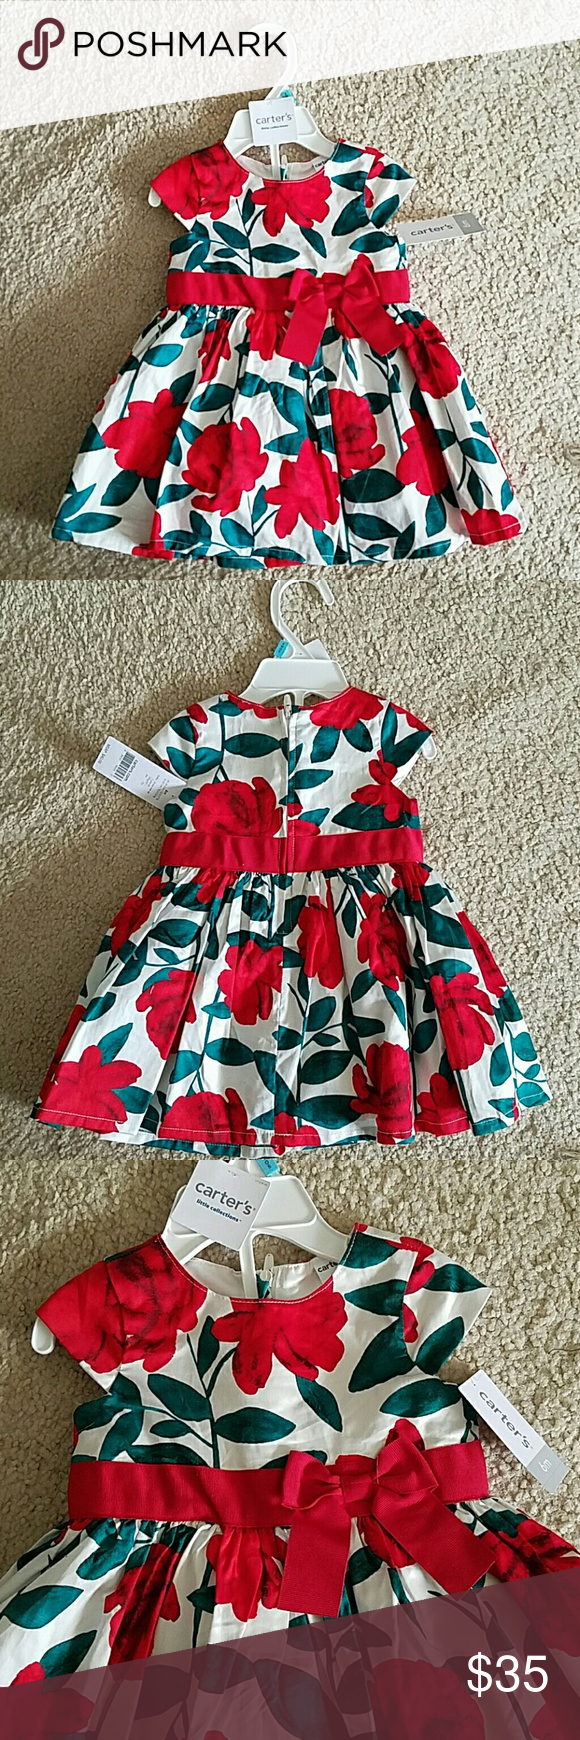 Christmas dress babies r us - Carter S Baby Girl Holiday Dress Nwt Nwt Carter S Baby Girl Floral Christmas Dress Absolutely Stunning